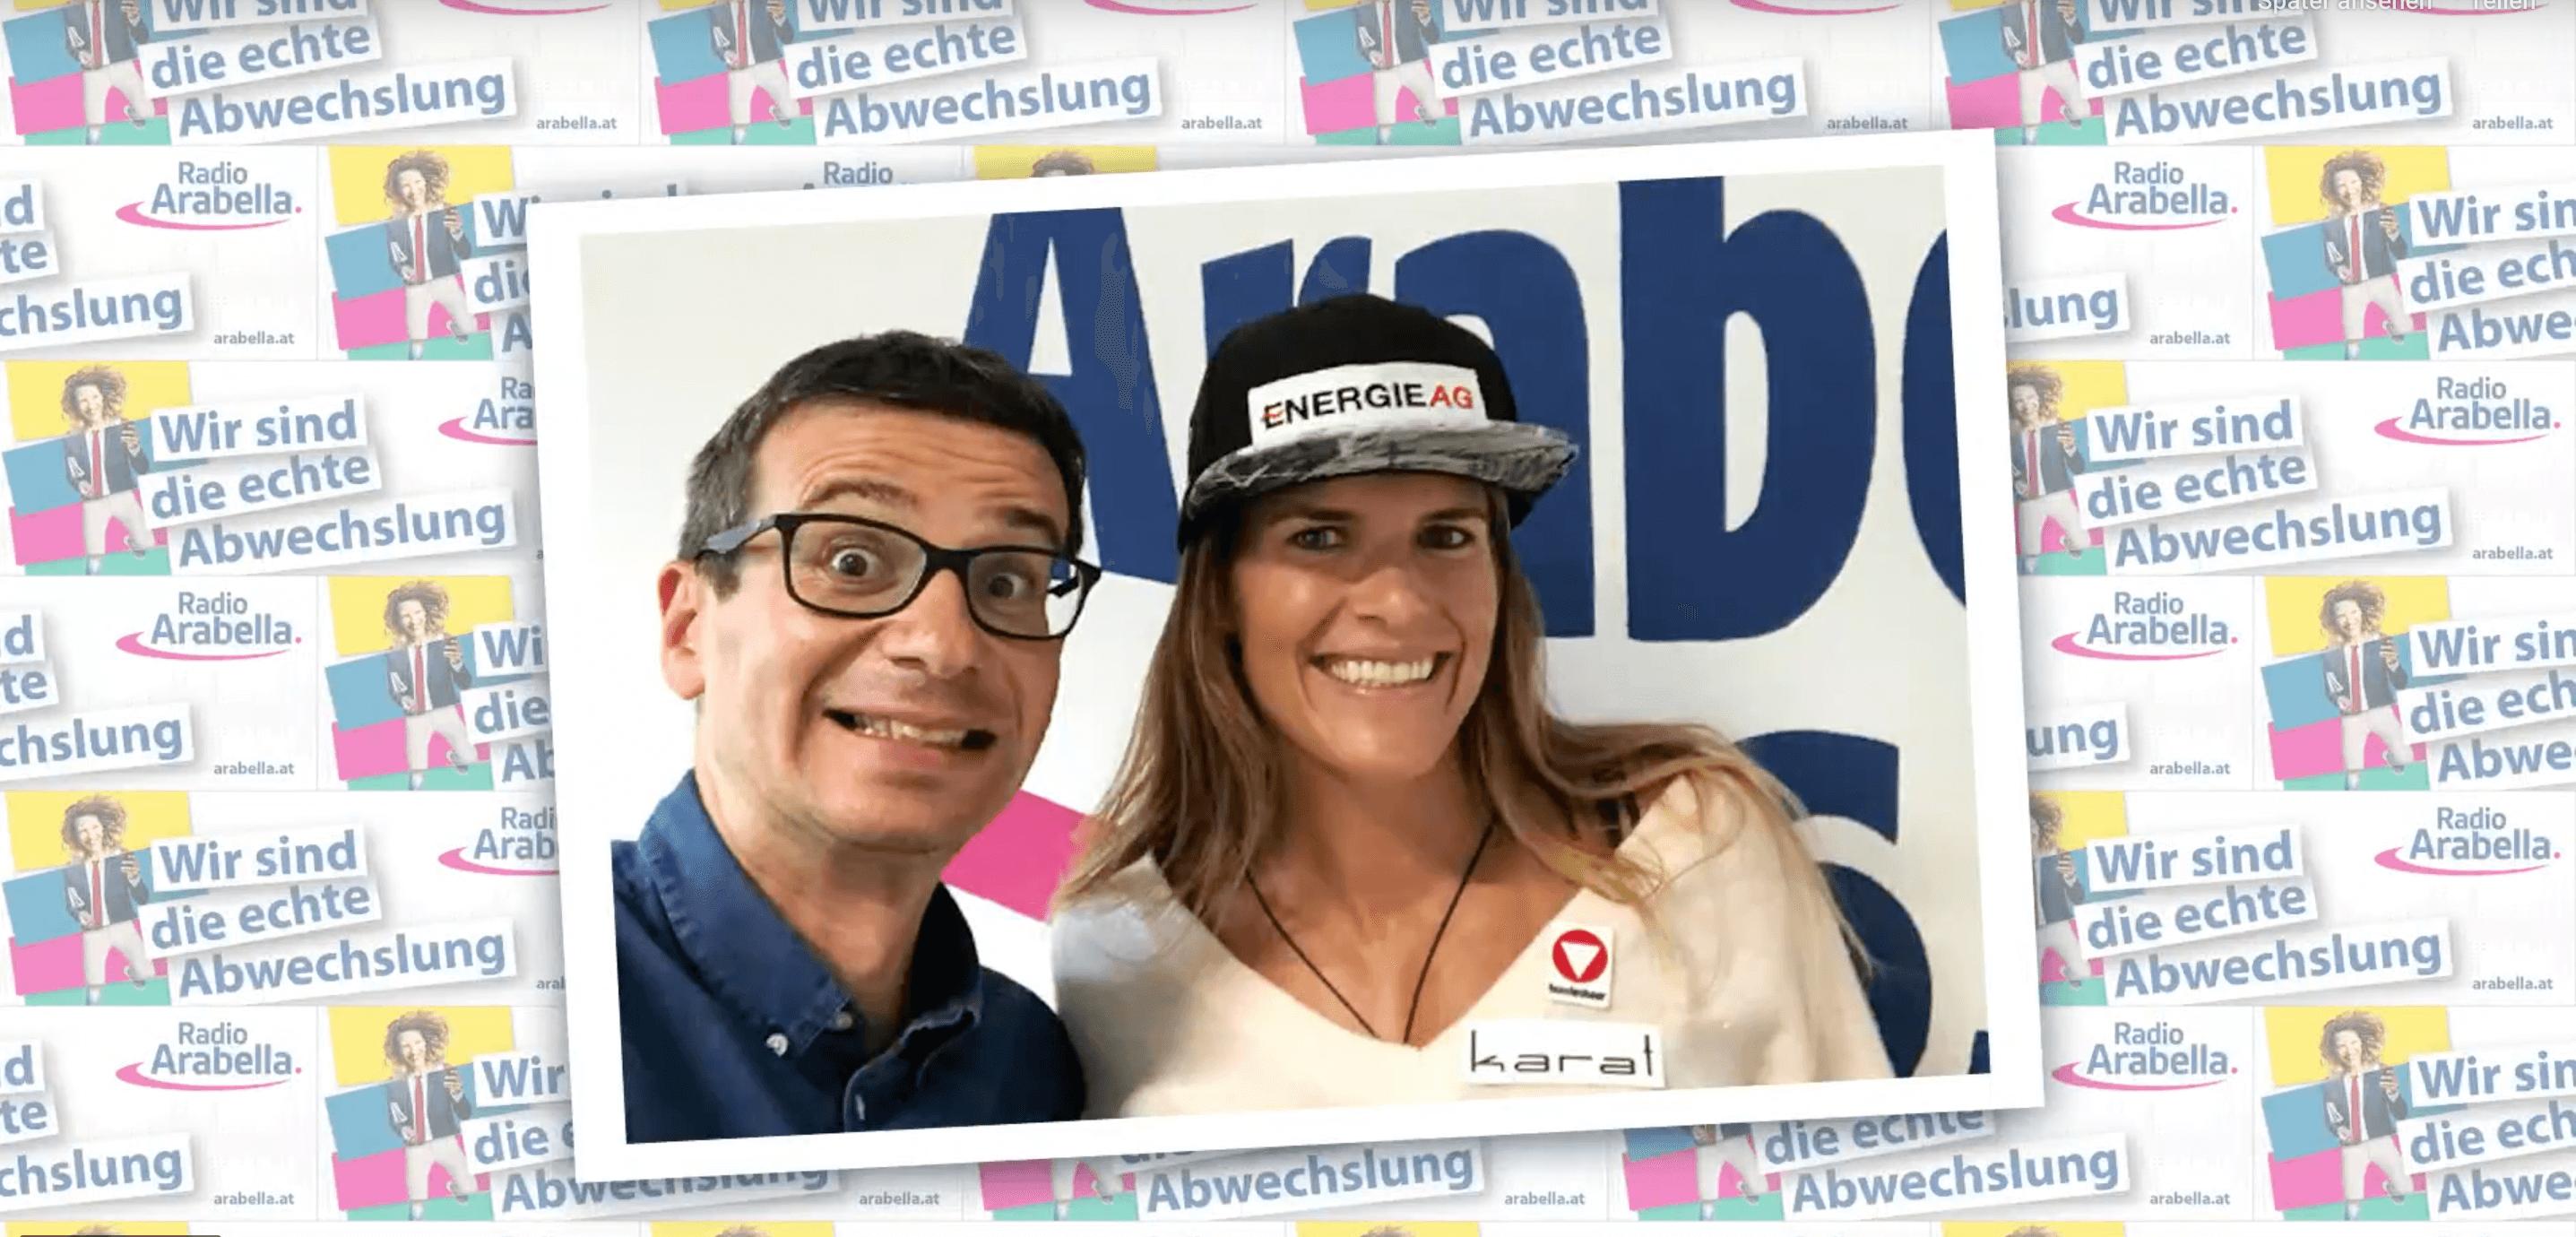 Radio Arabella: Hitparade meines Lebens